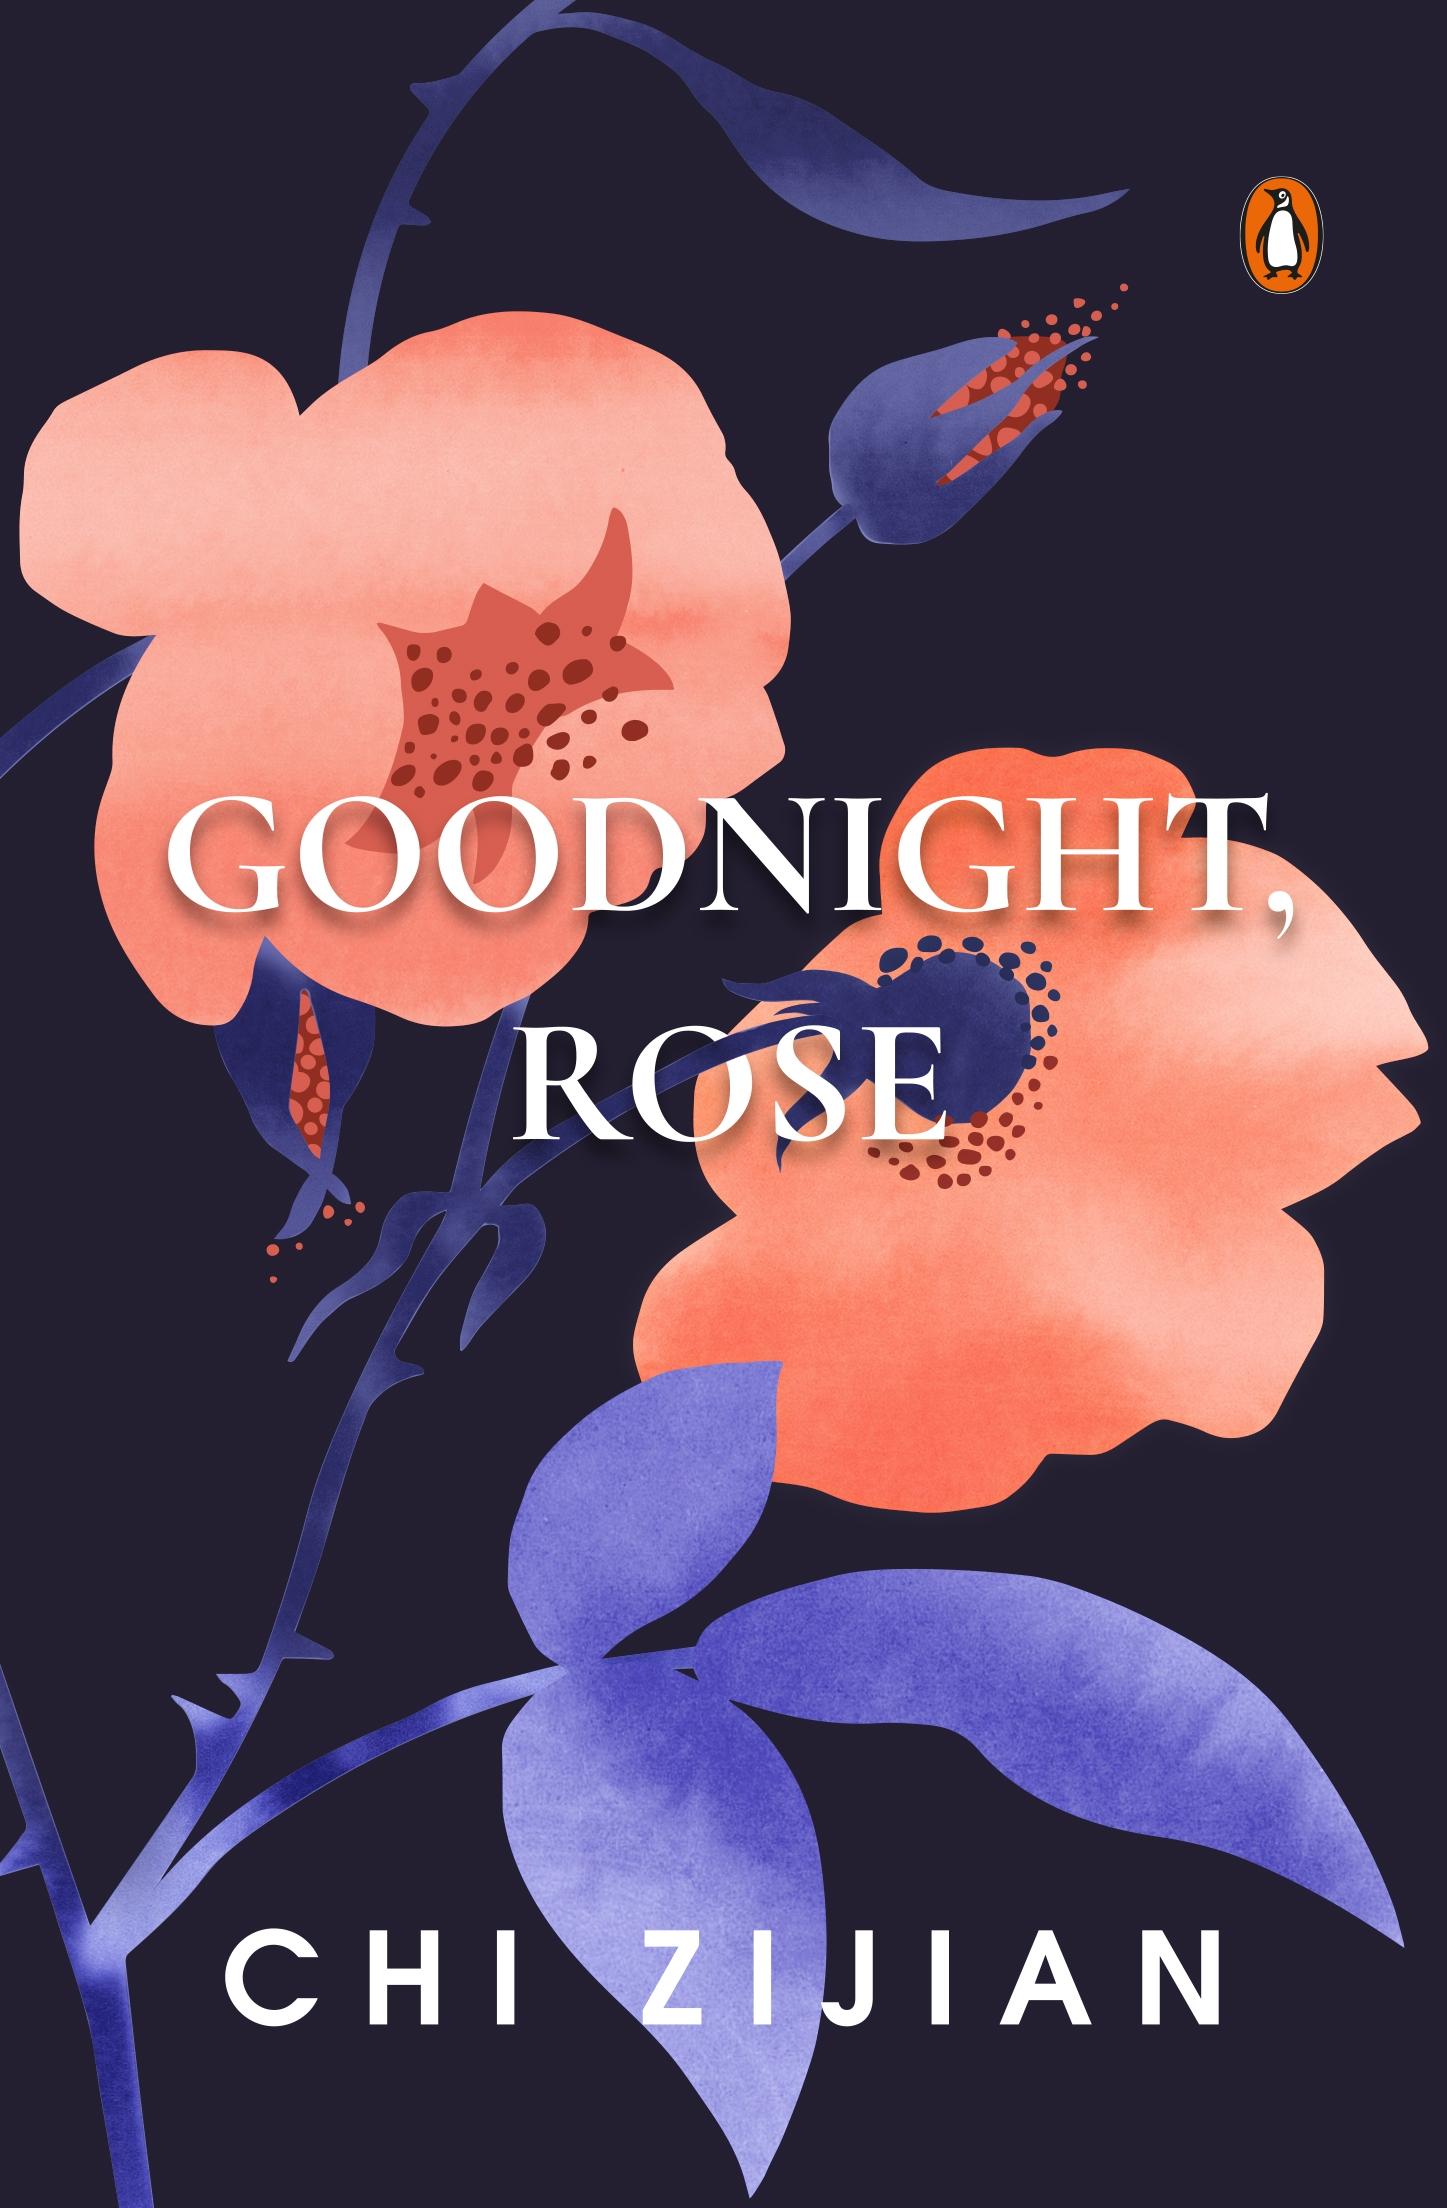 Goodnight, Rose by Chi Zijian - Penguin Books New Zealand